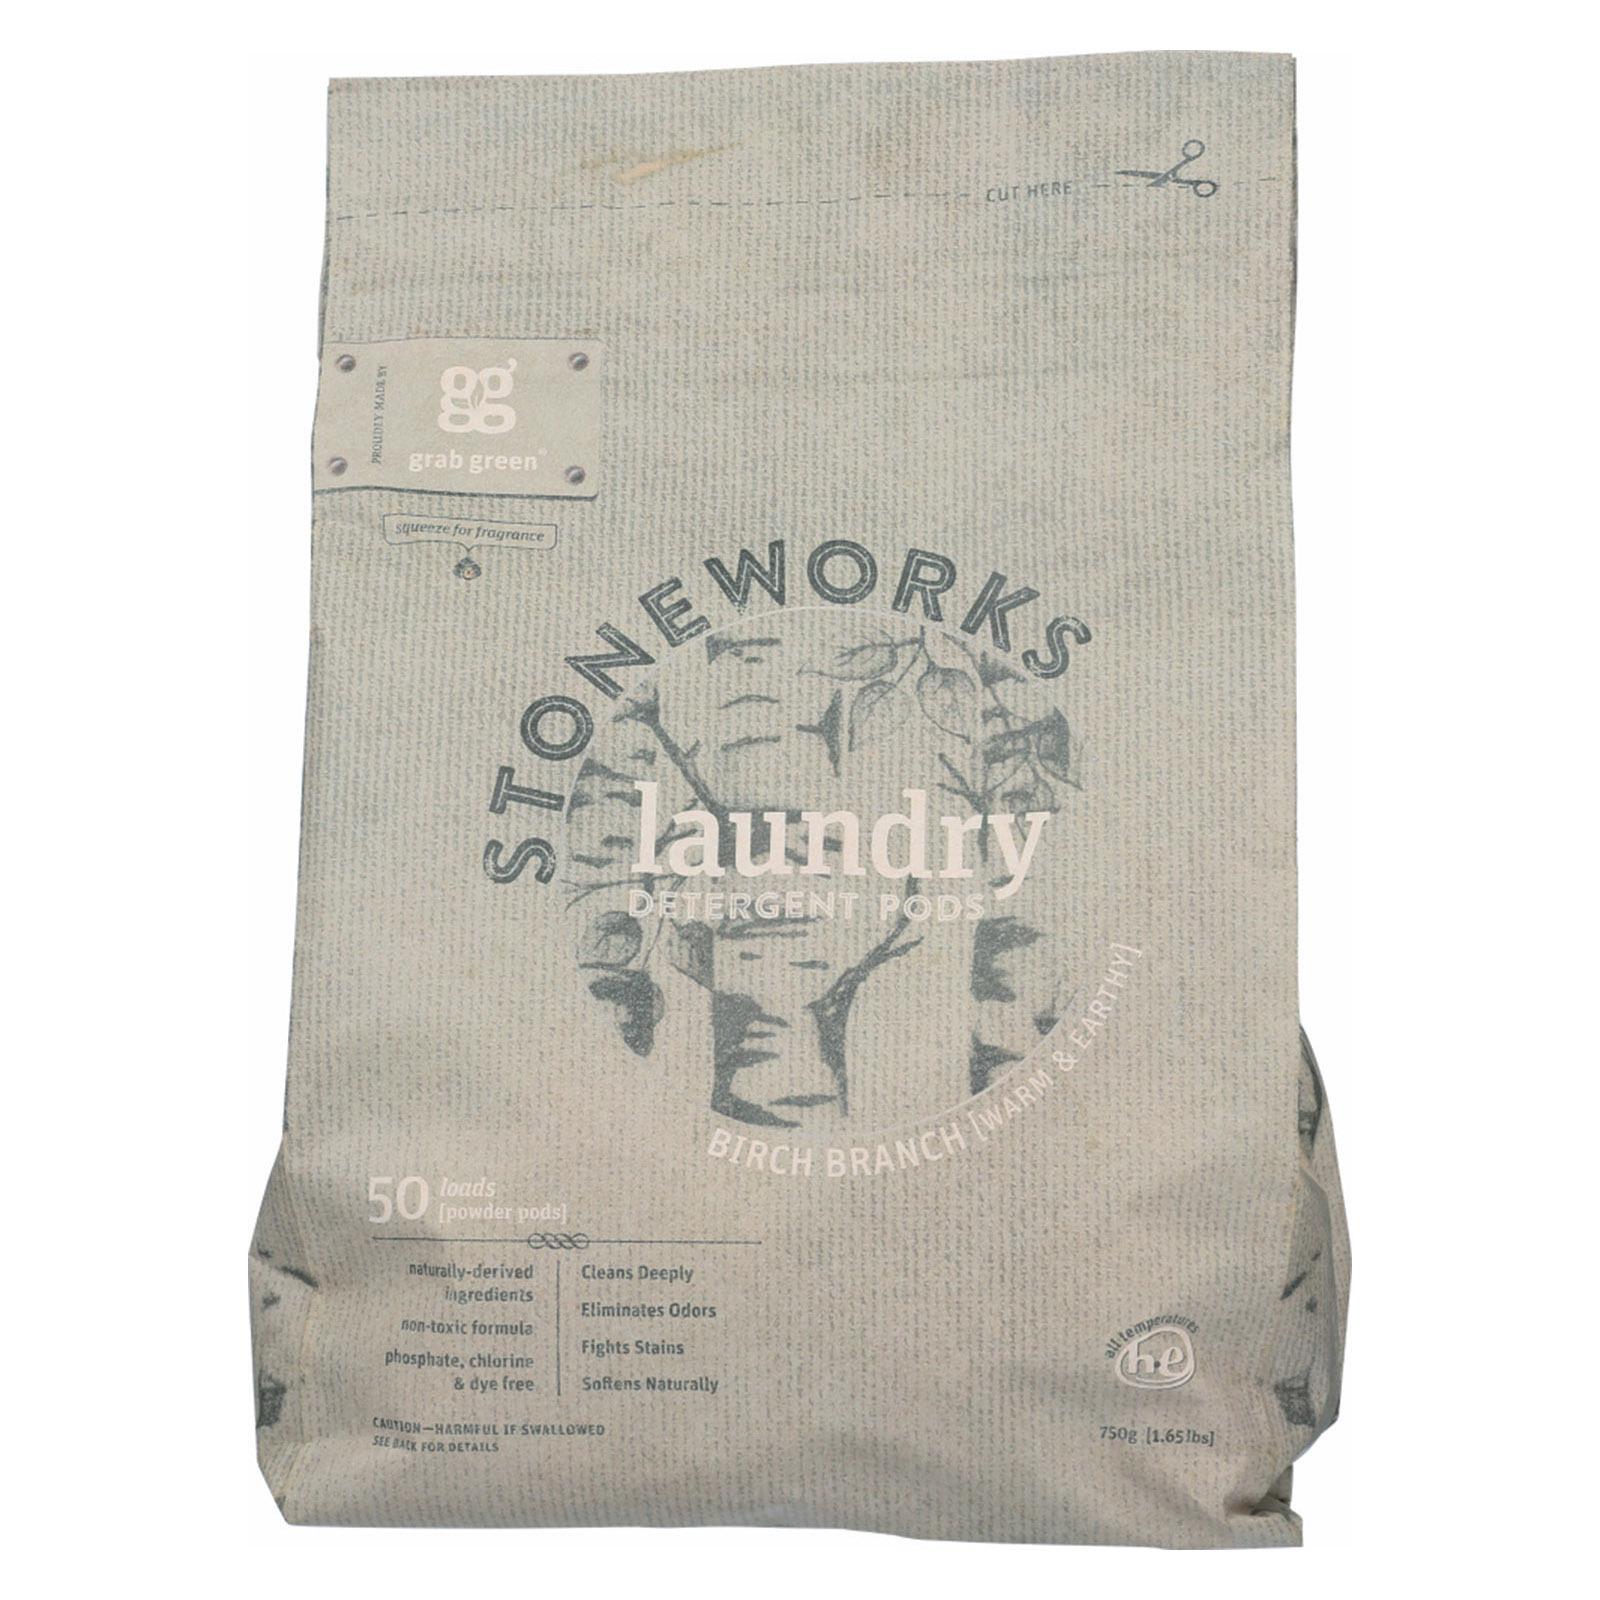 Stoneworks Laundry Detergent Pods - Birch Branch - Case of 6 - 50 count